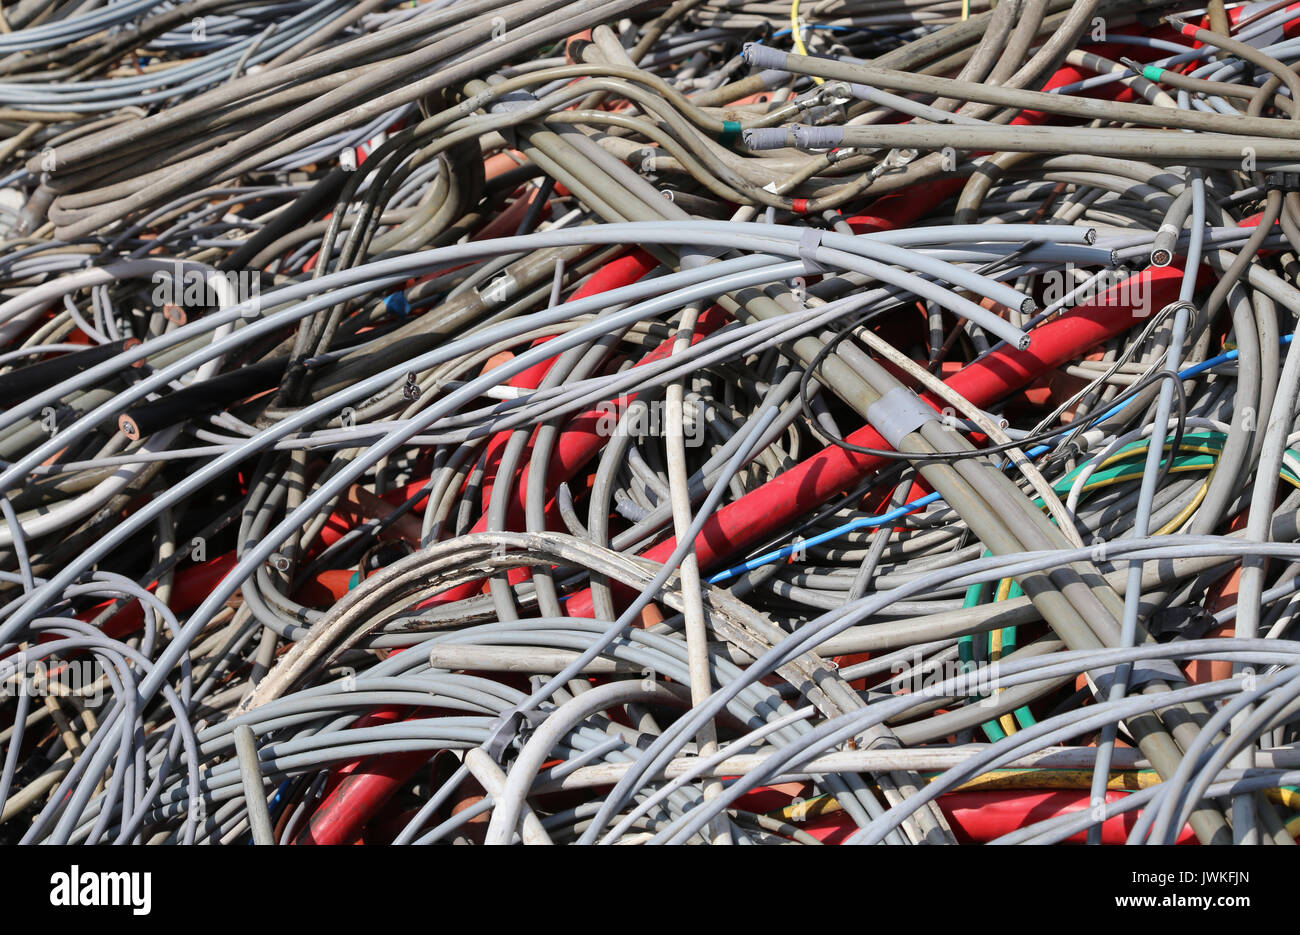 Wires Scrap Copper Stock Photos & Wires Scrap Copper Stock Images ...